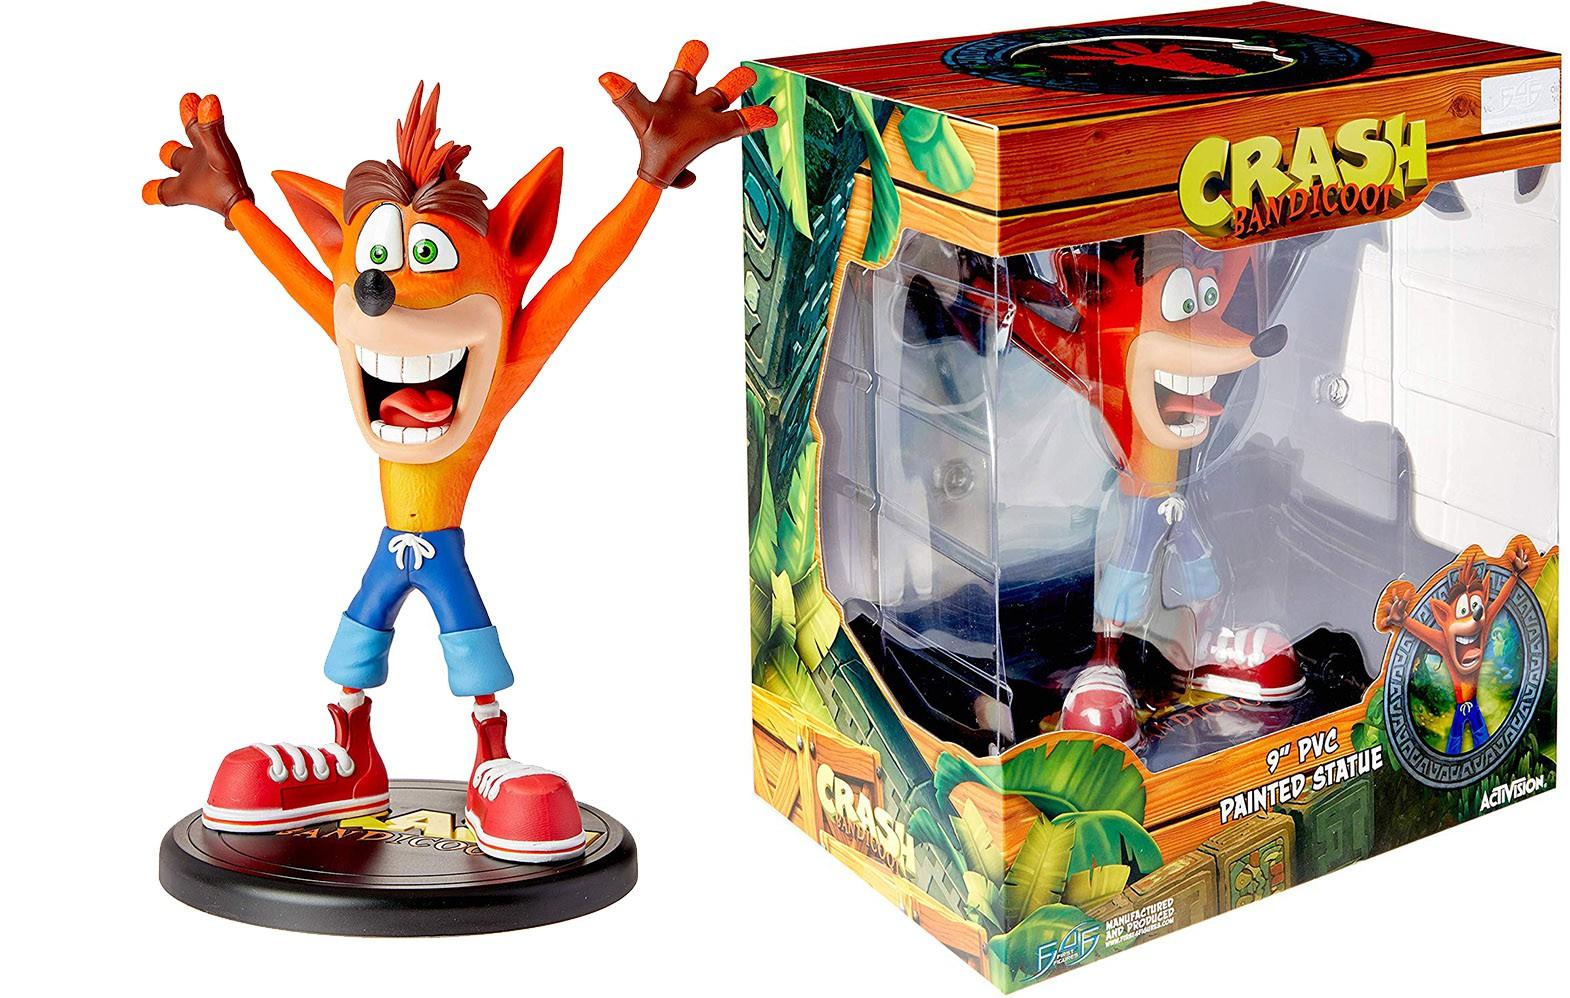 Crash Bandicoot (N Sane Trilogy) statula | 23cm